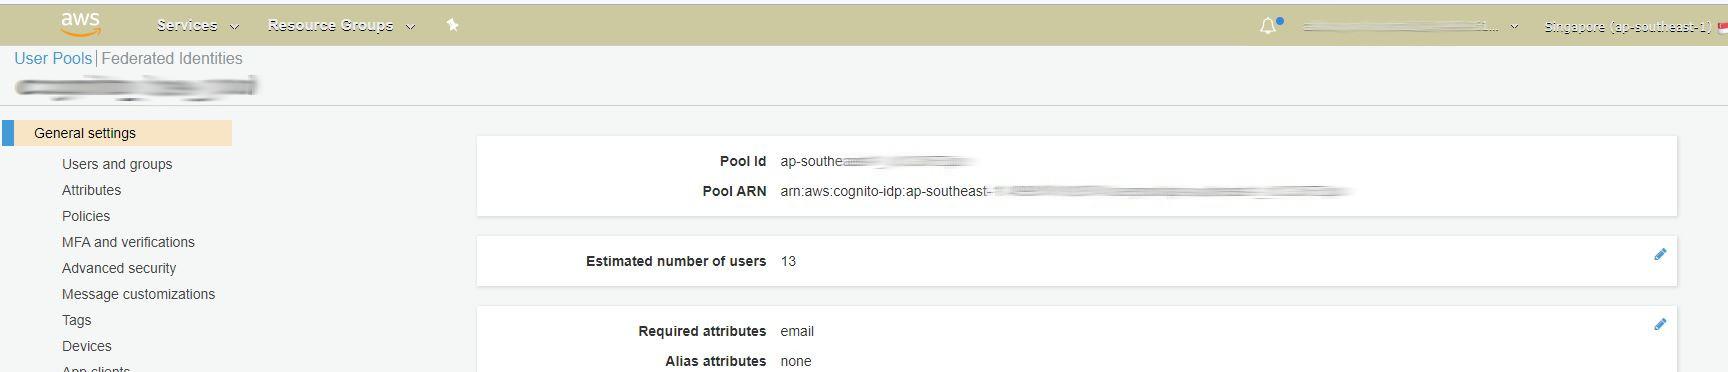 user_pool